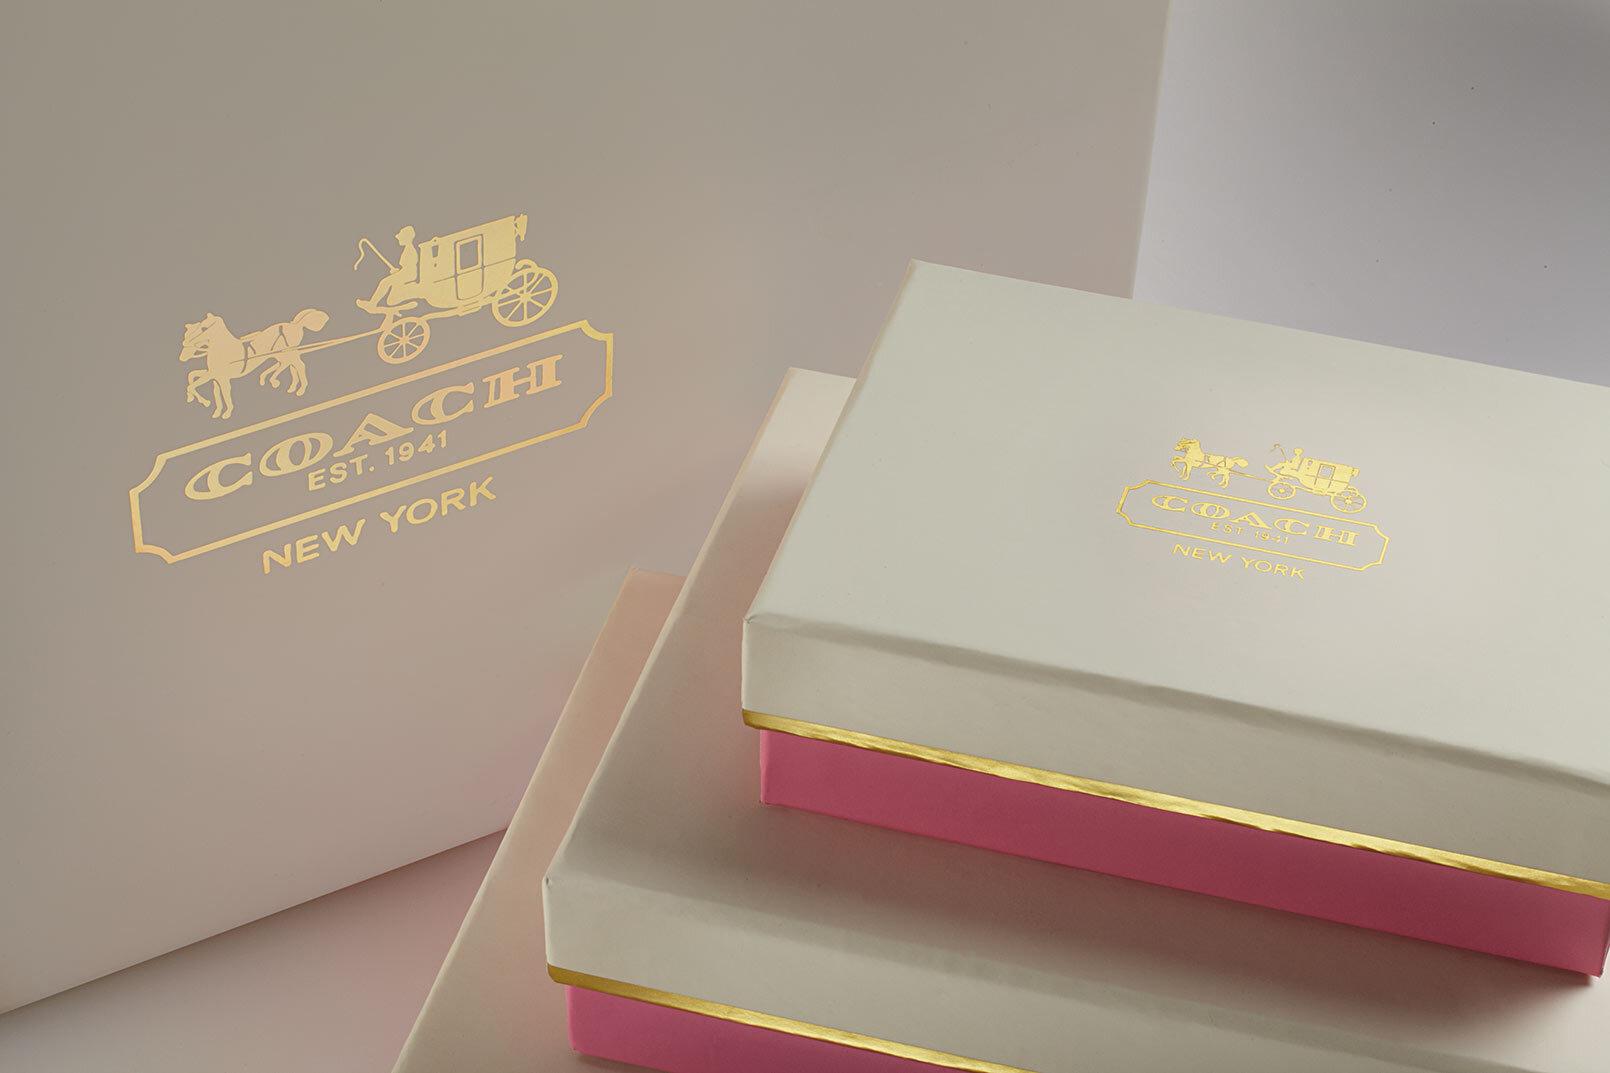 Coach-Box-Holiday-Design-Packaging-Company-8.jpg